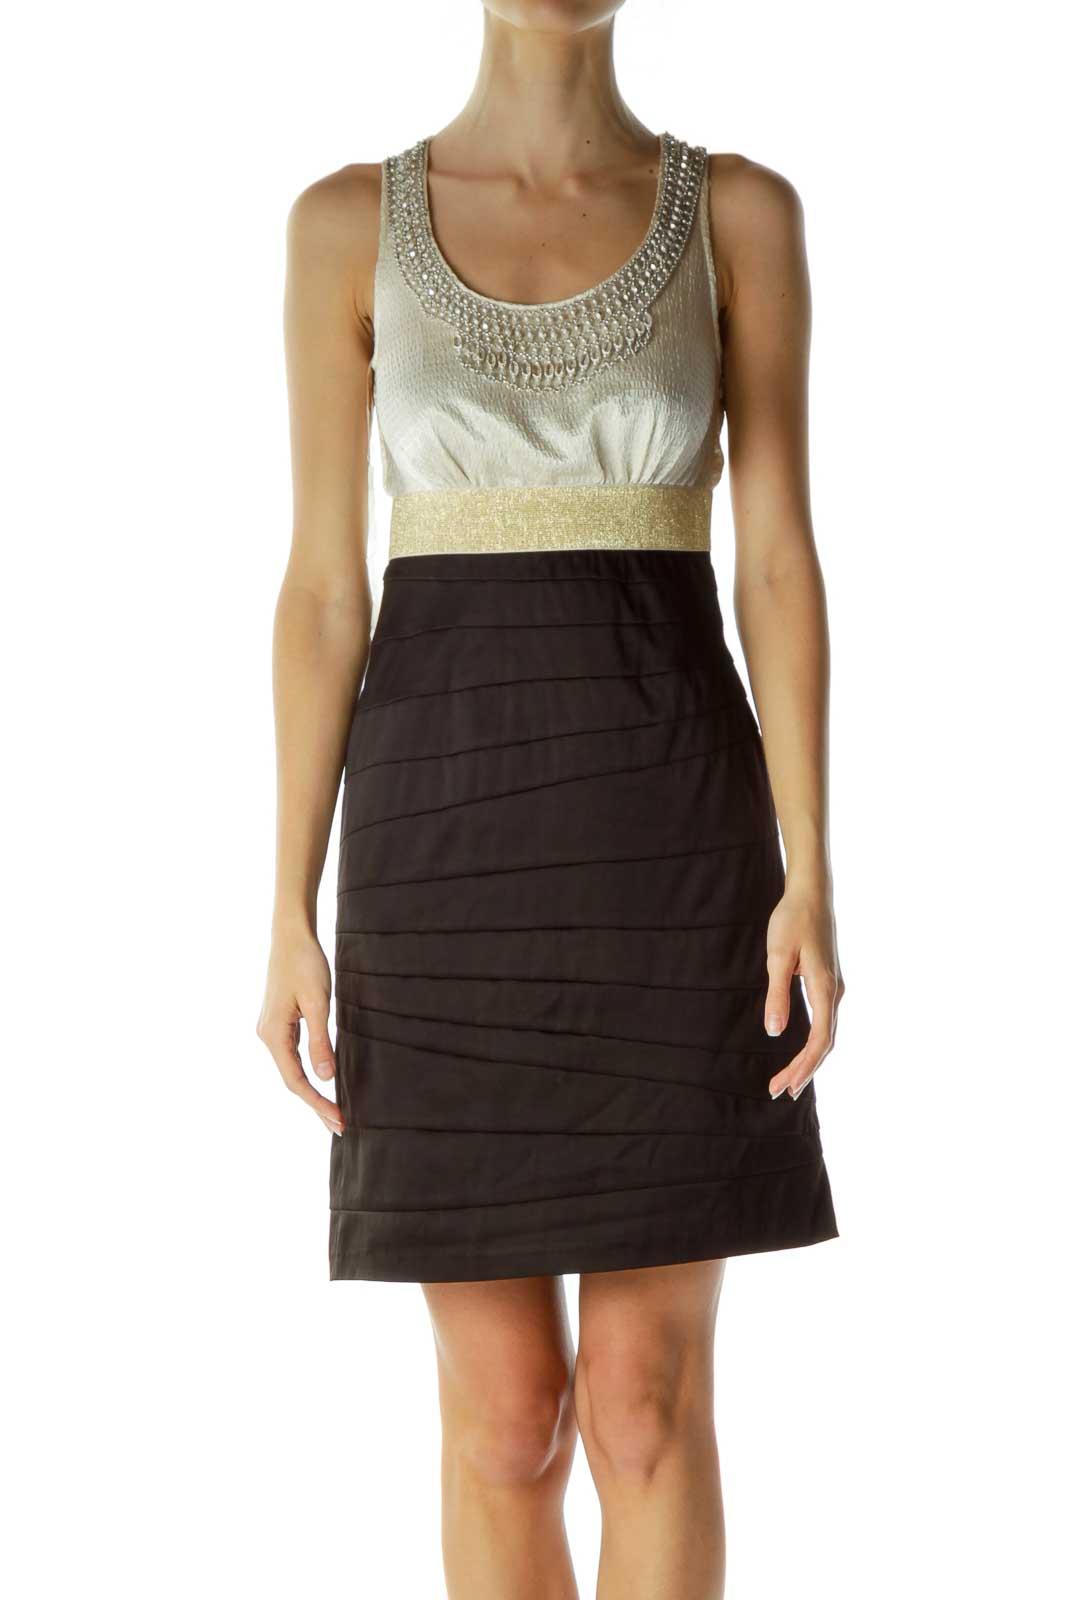 Black Beige Sheath Dress with Beaded Neckline